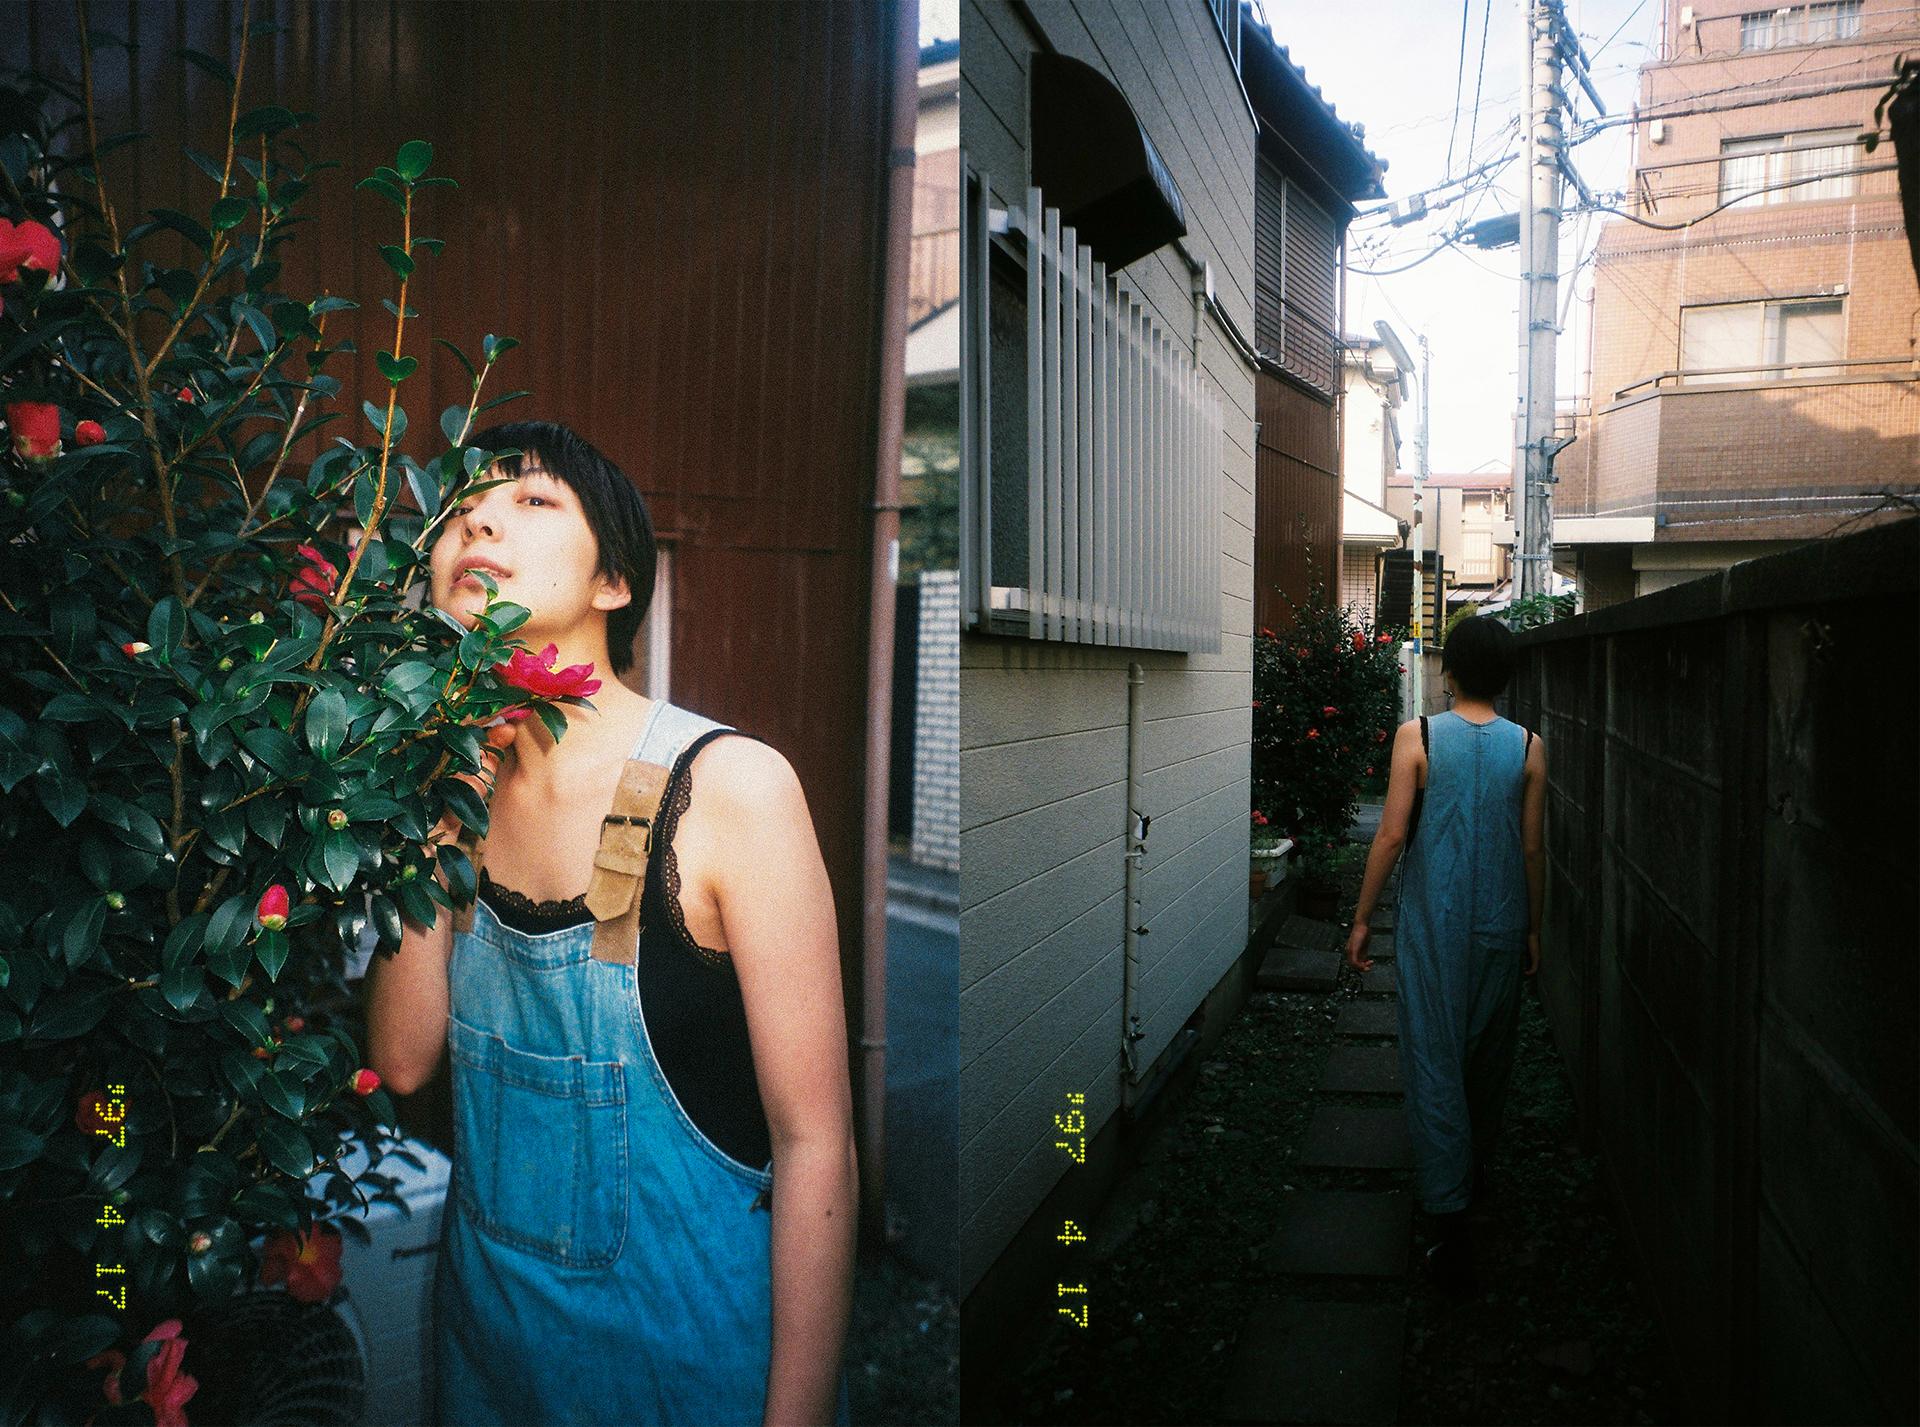 刈馬 健太 | Kenta Karima